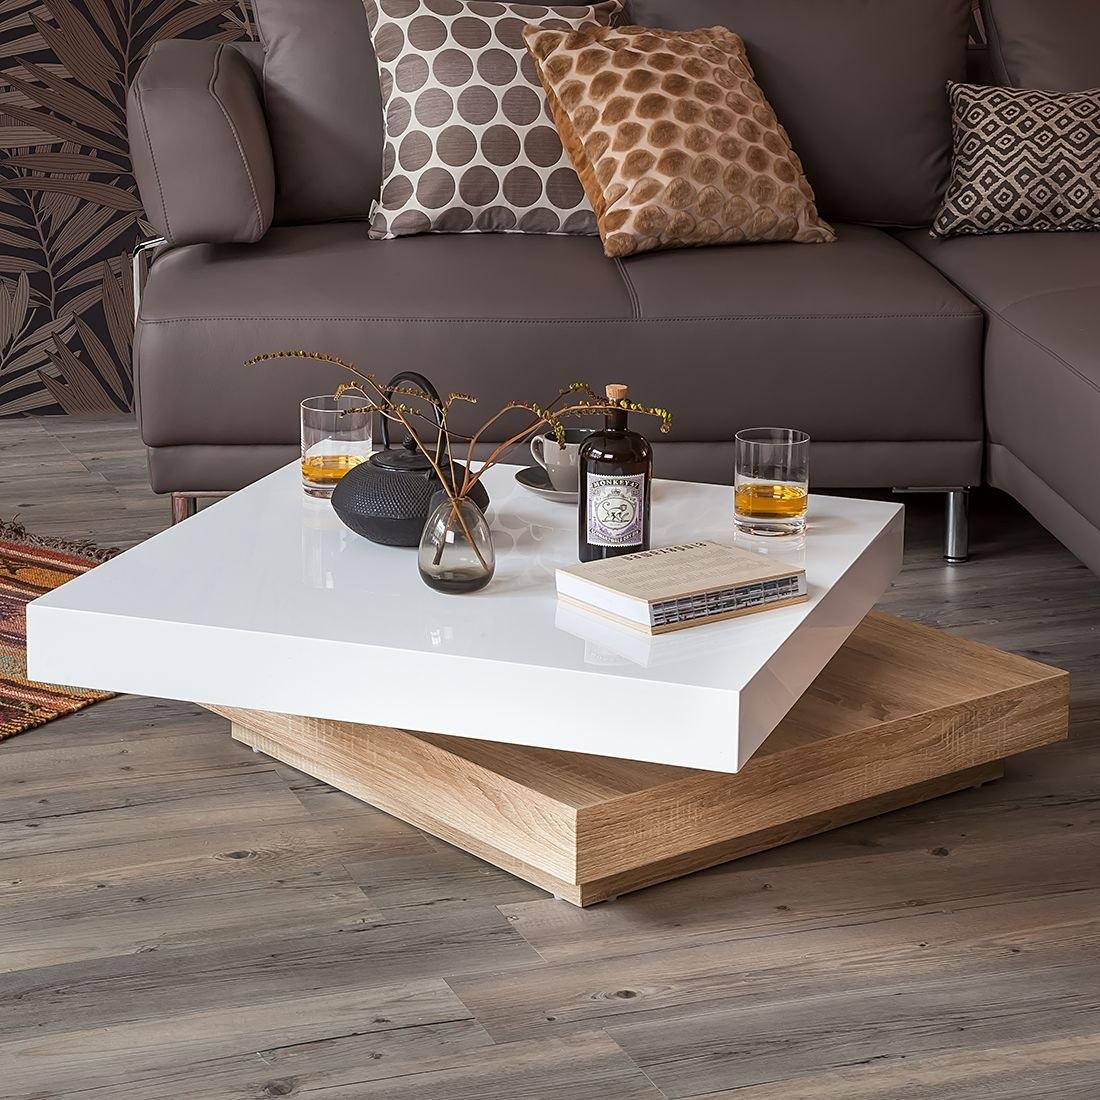 mesa de centro giratoria roble y blanco ref girasol plus en mercado libre. Black Bedroom Furniture Sets. Home Design Ideas